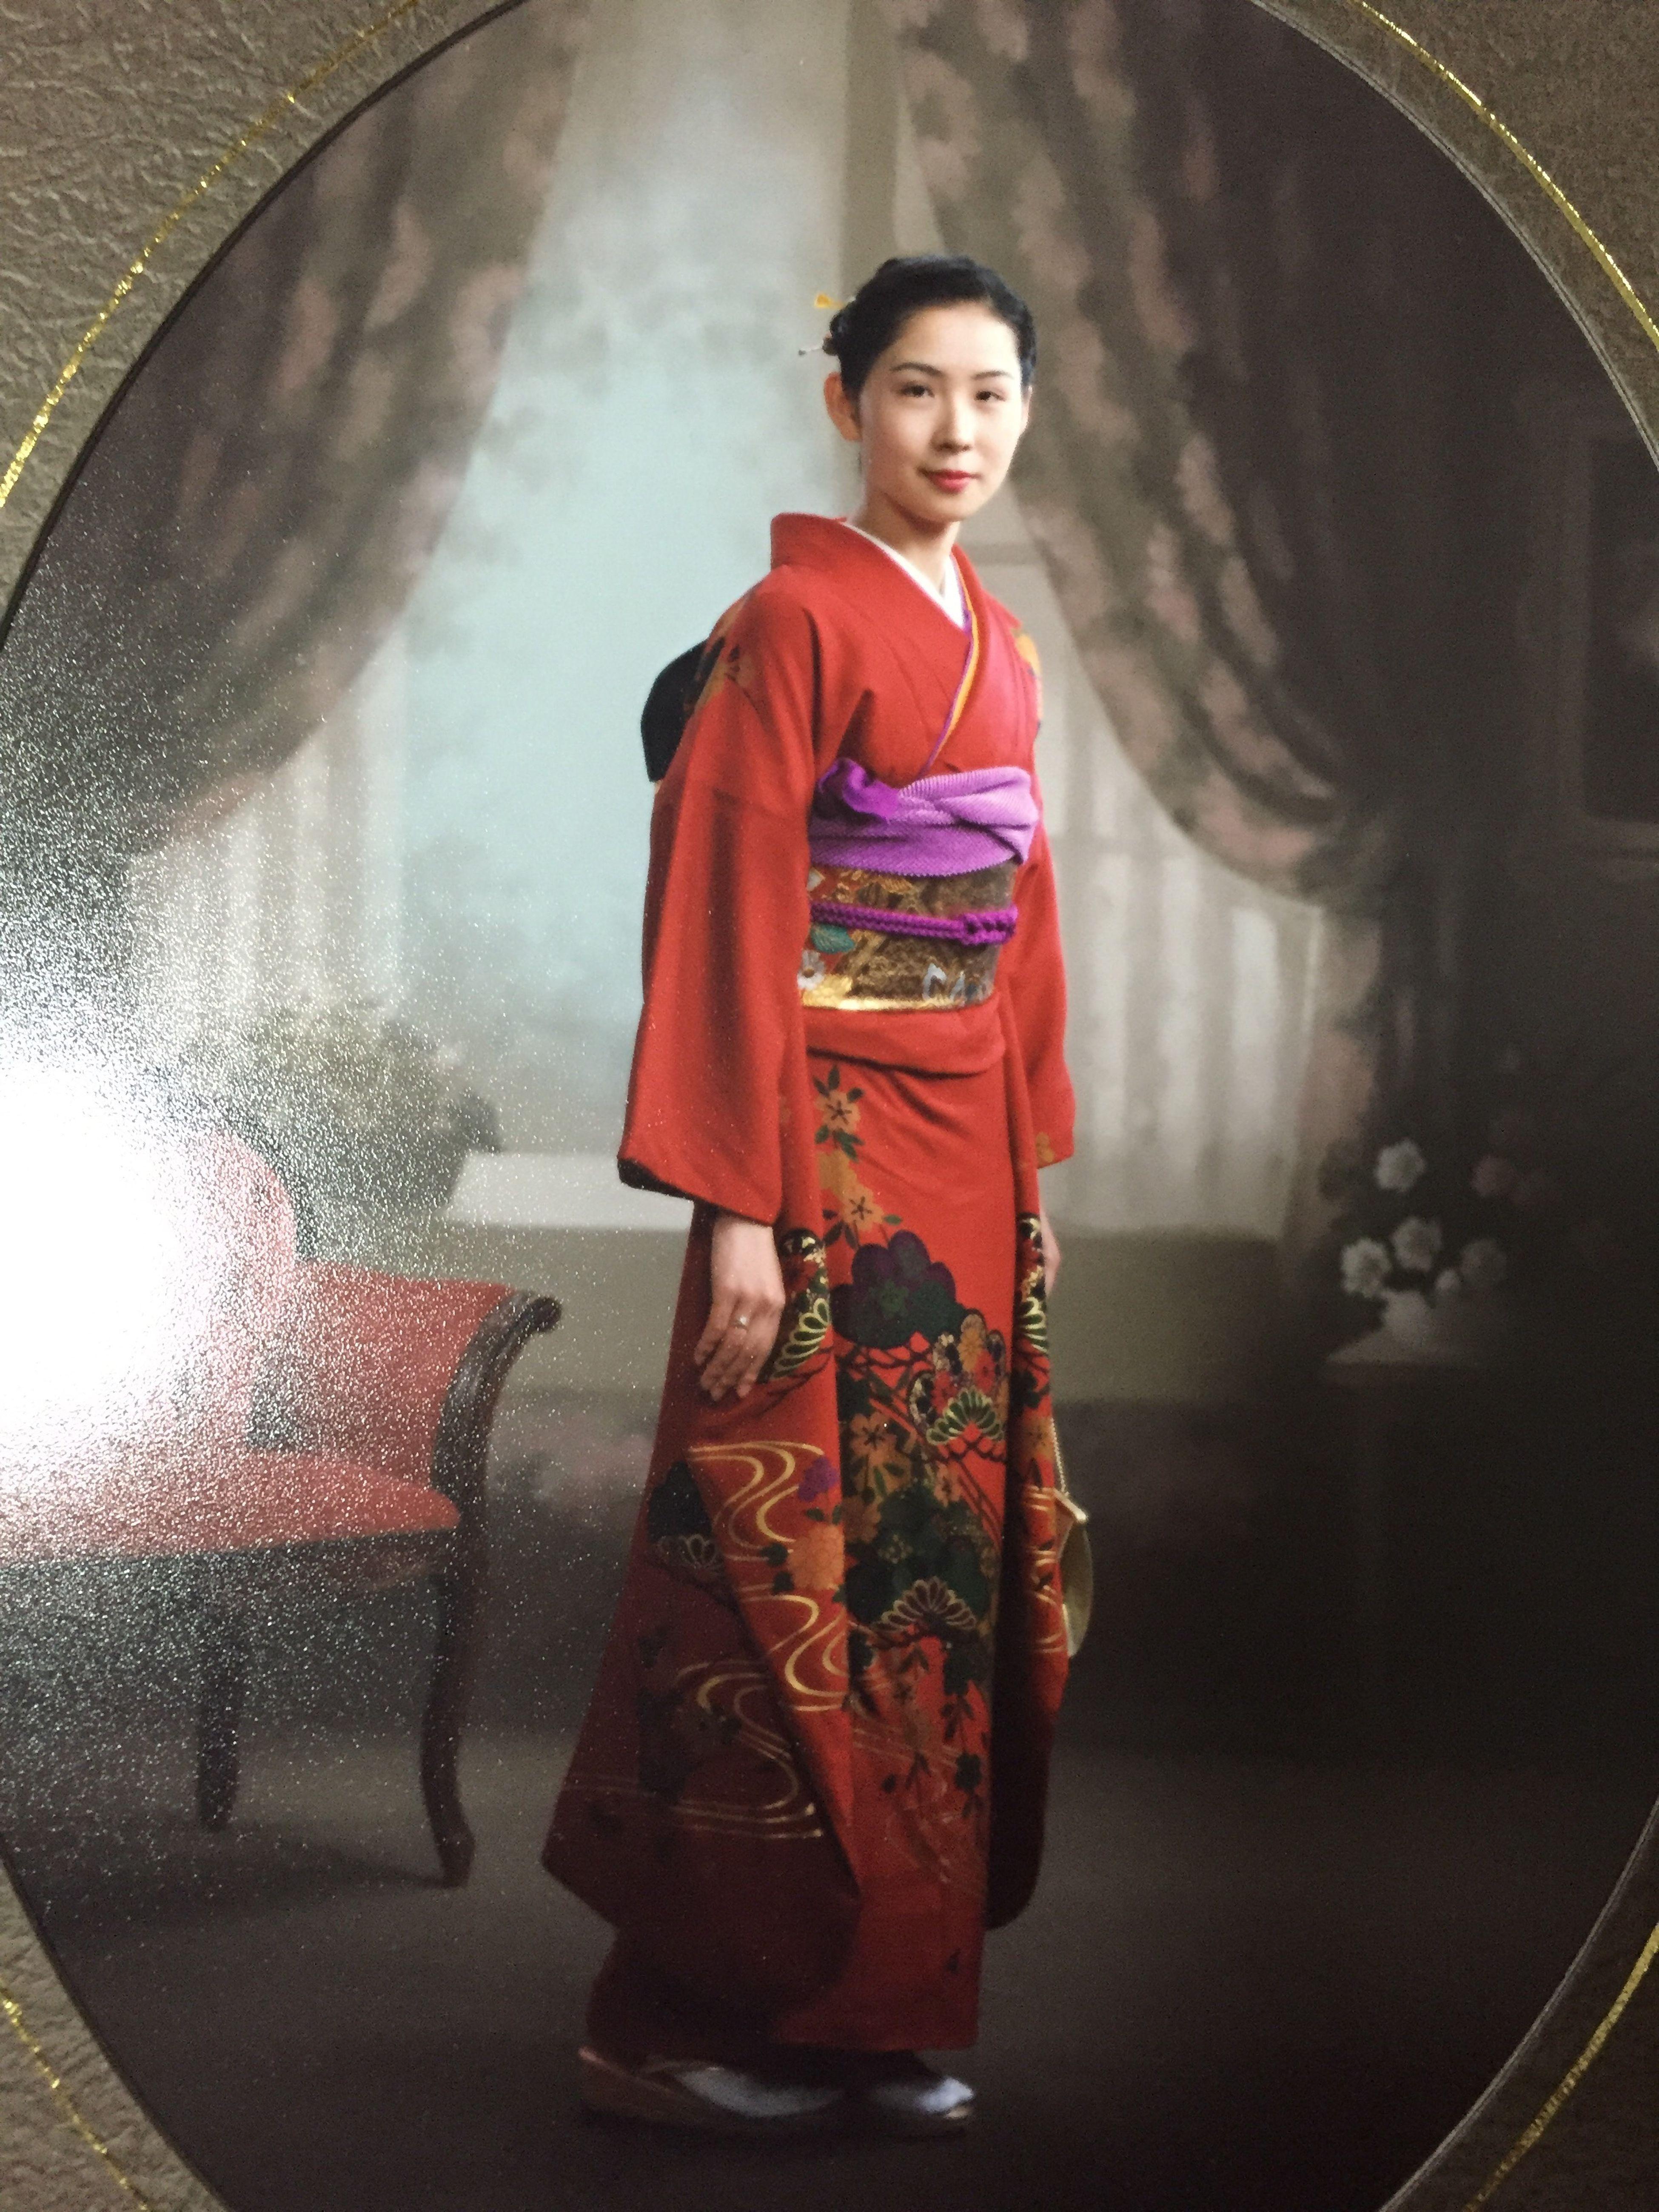 Portrait Memory Japanese  Kimono Japan Memorial 成人式 記念撮影 昭和の香り 着物 二十歳 もはやレトロ